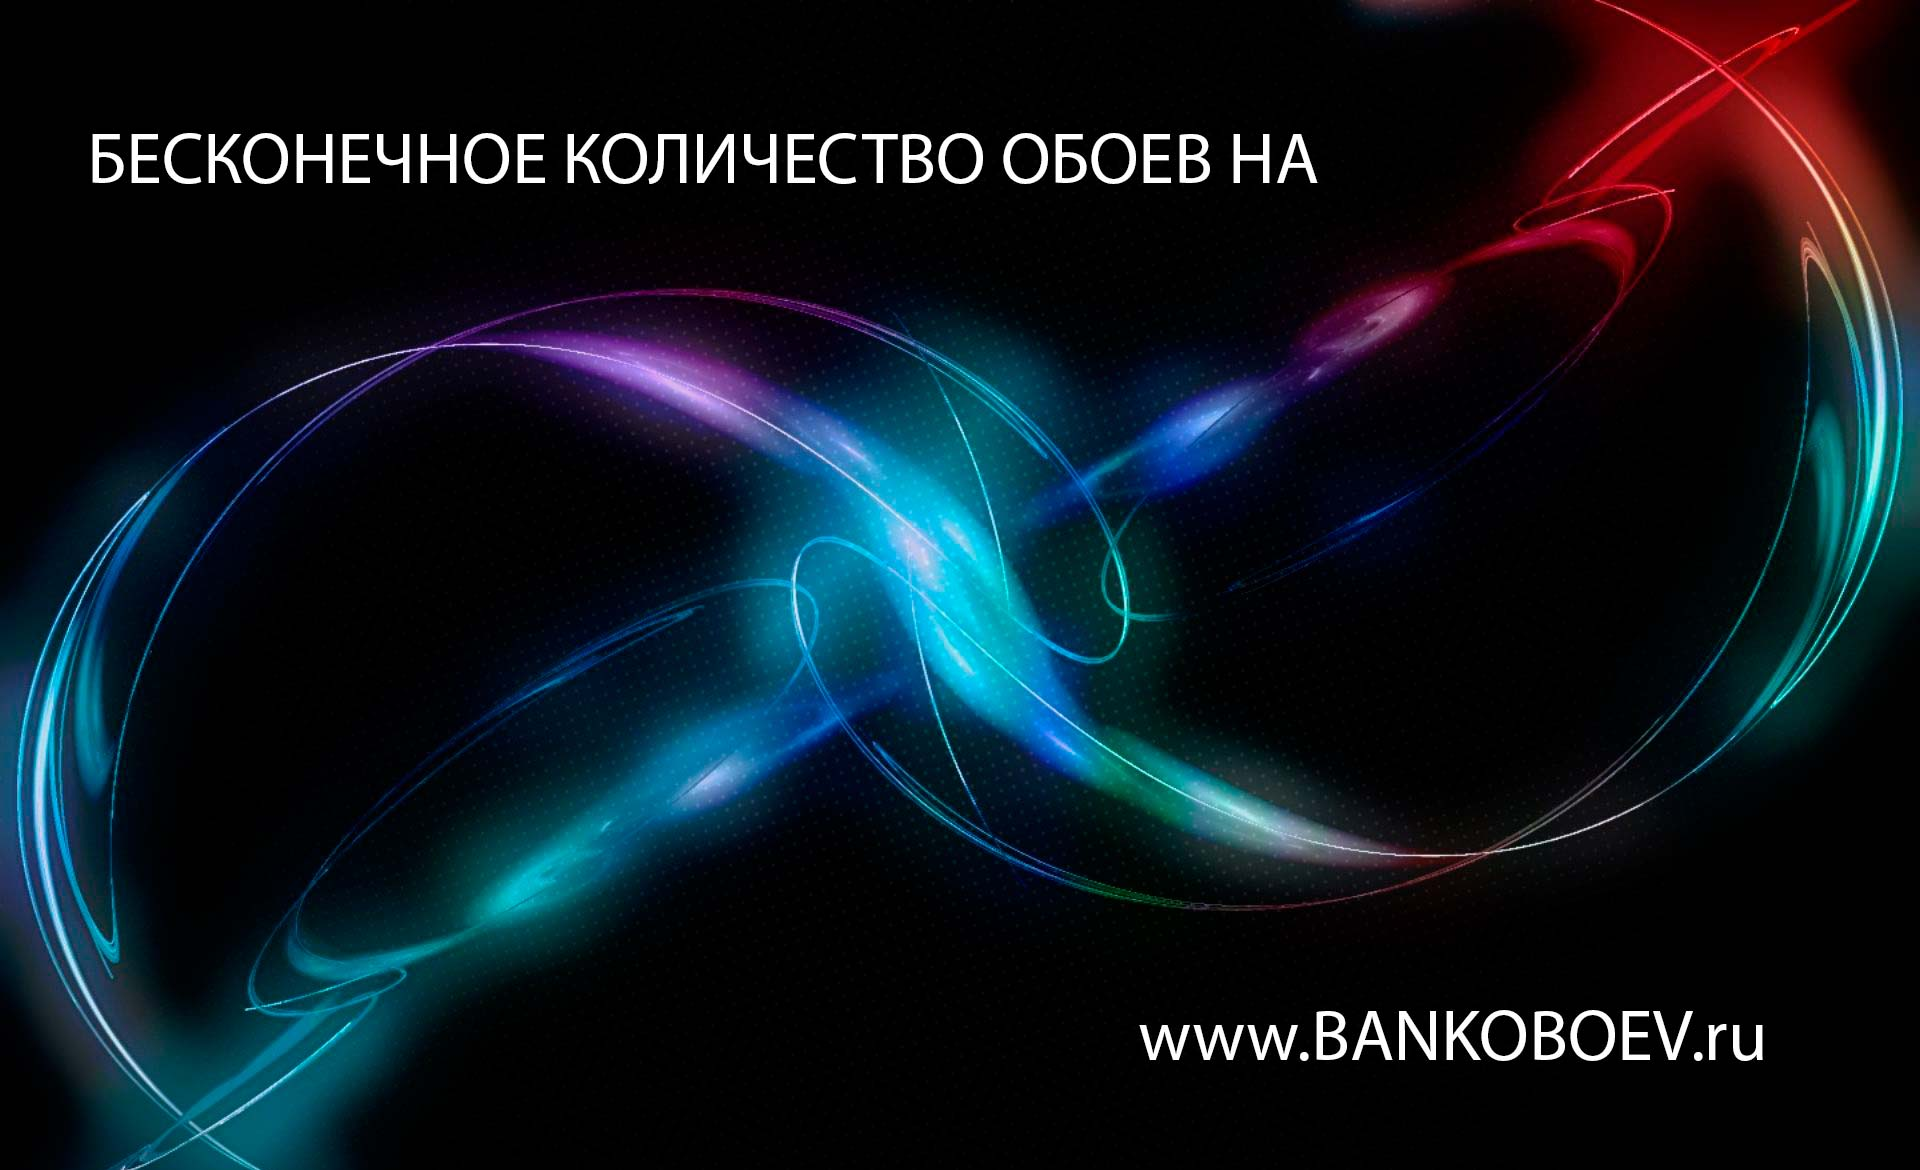 Neon Wallpaper Hd wallpaper   598845 1920x1170